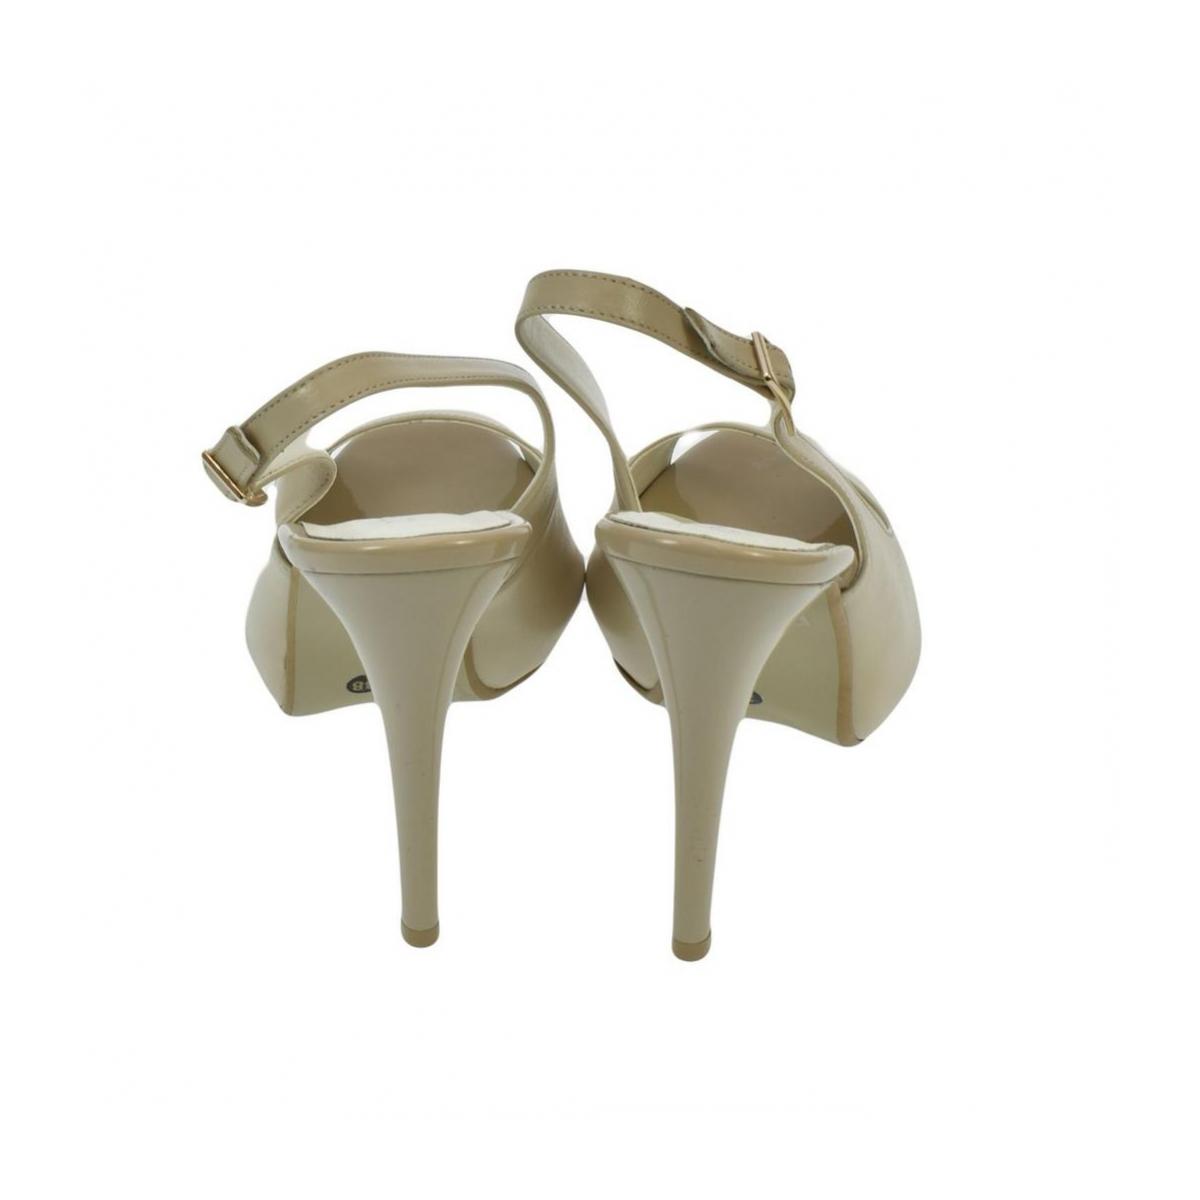 3c1d5707503b Dámske kožené béžové sandále SINNI - 6